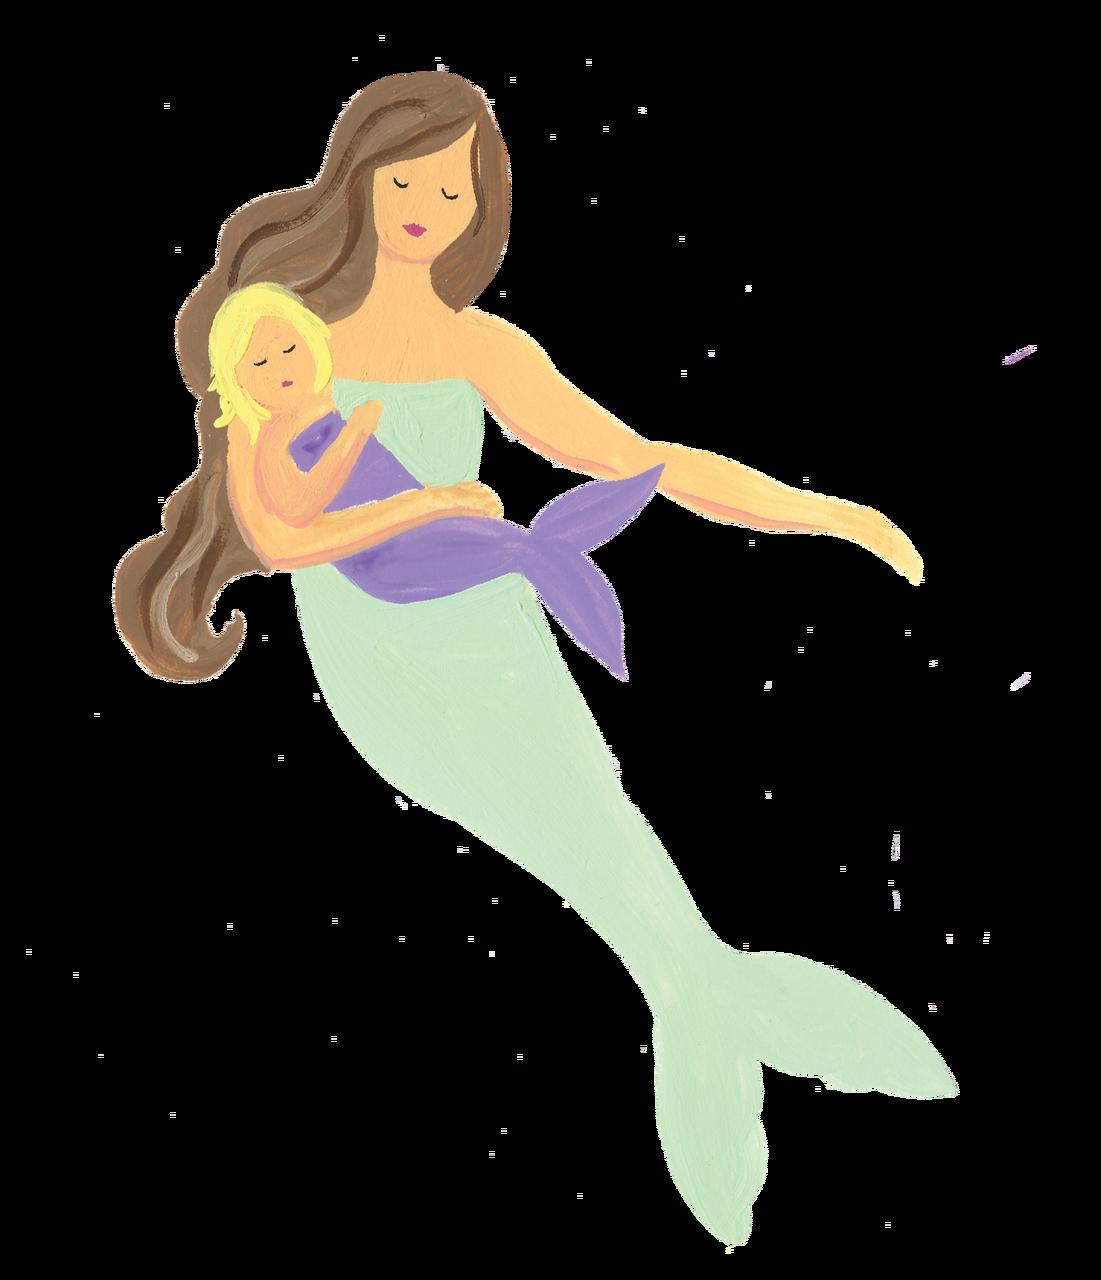 Mermaid with Baby Print & Cut File